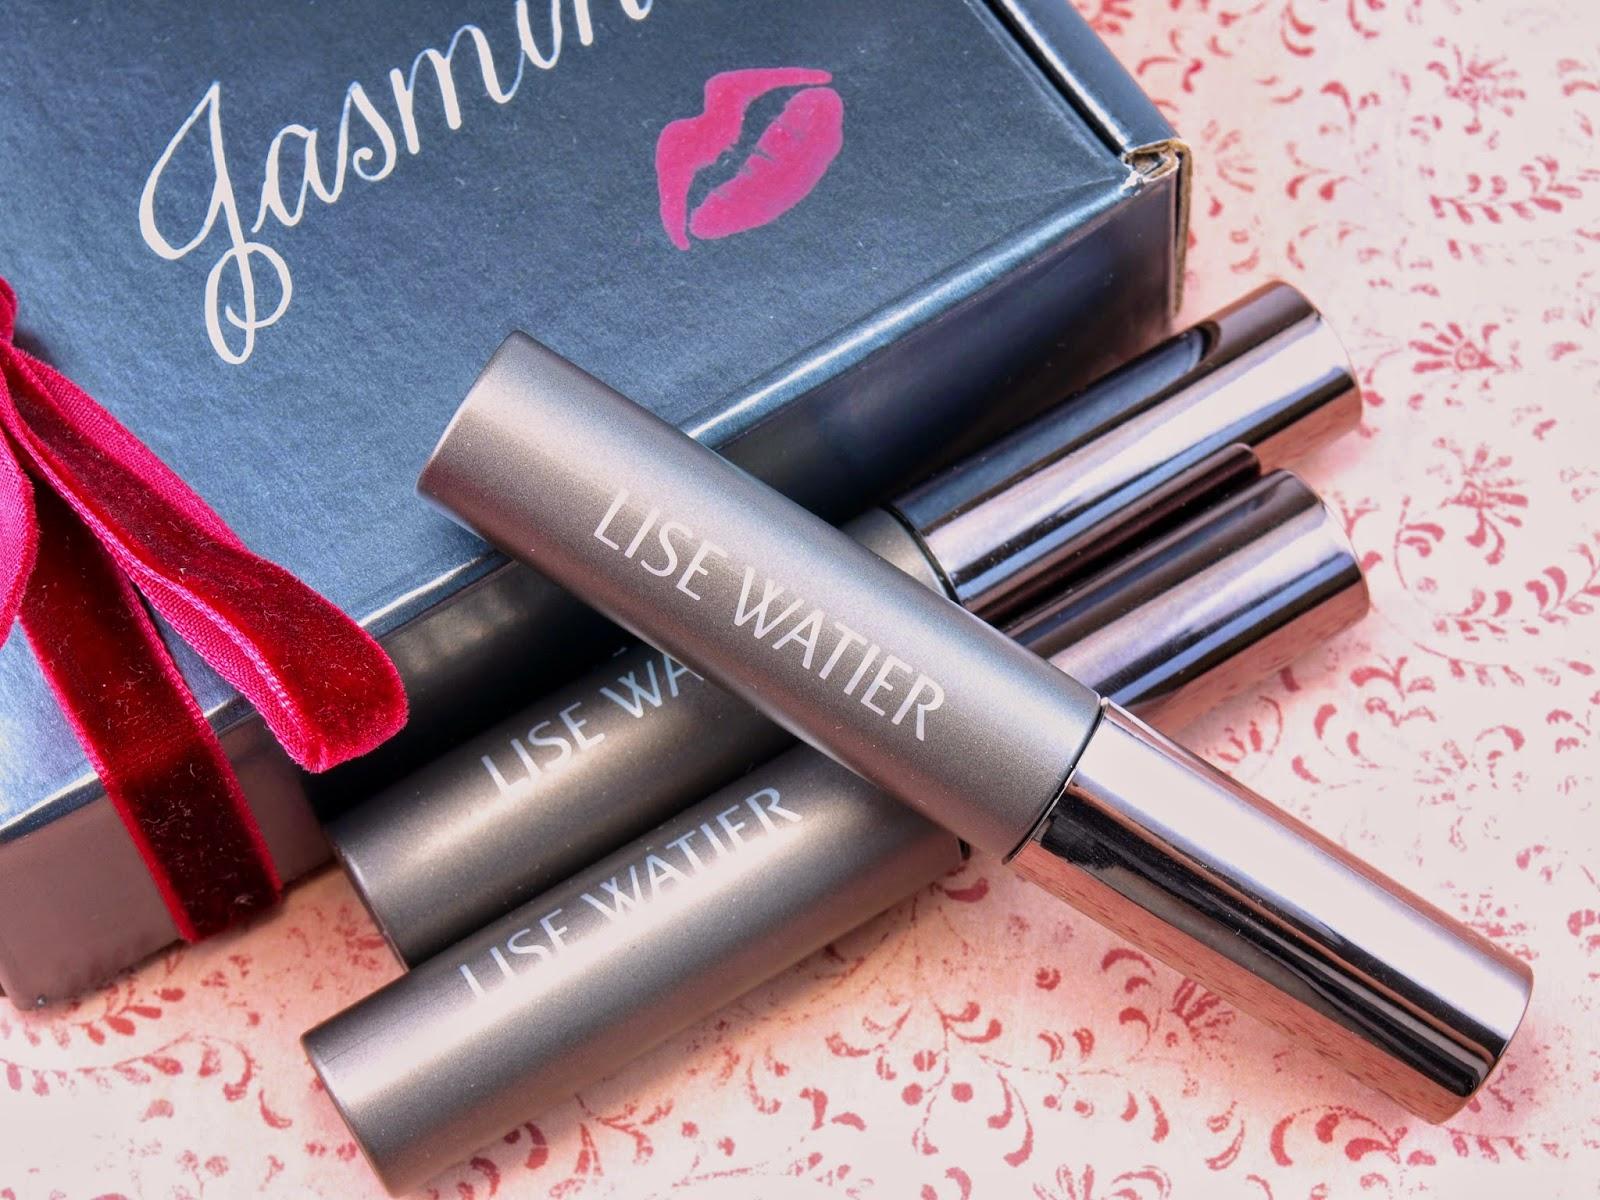 Lise Watier Baiser Velours Liquid Lipsticks: Review and Swatches